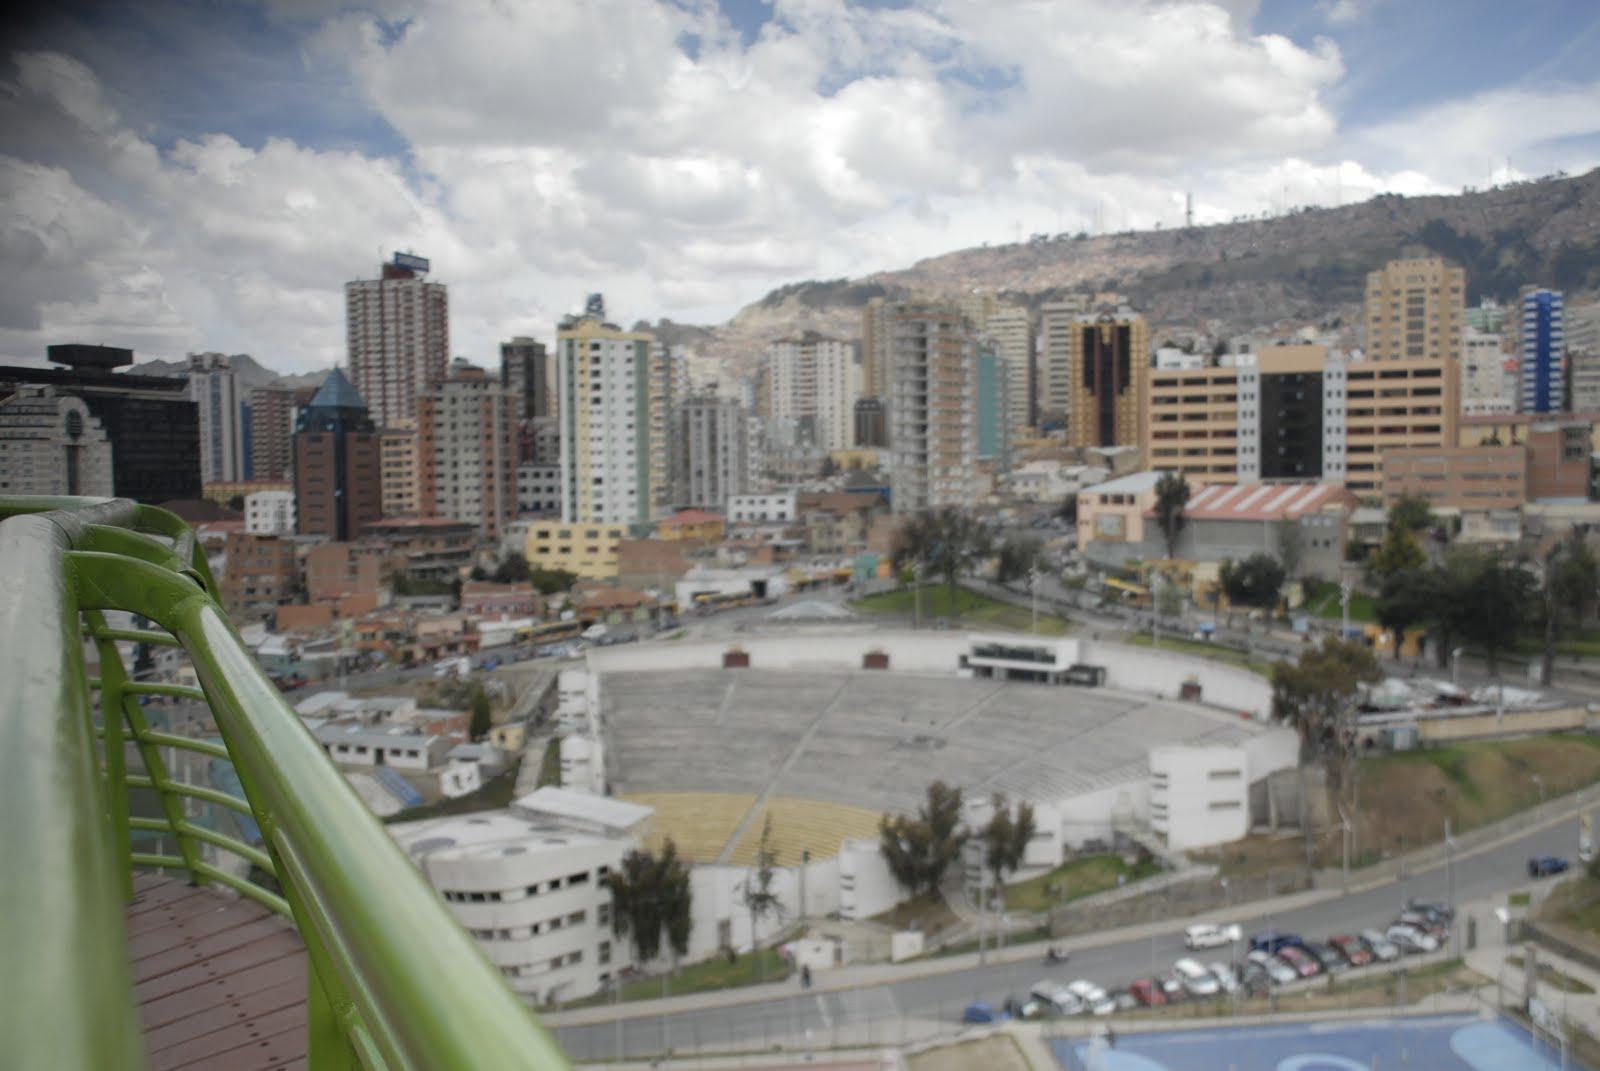 El Archivo de La Paz(Casa Montes), visto desde el cerro Laikakota